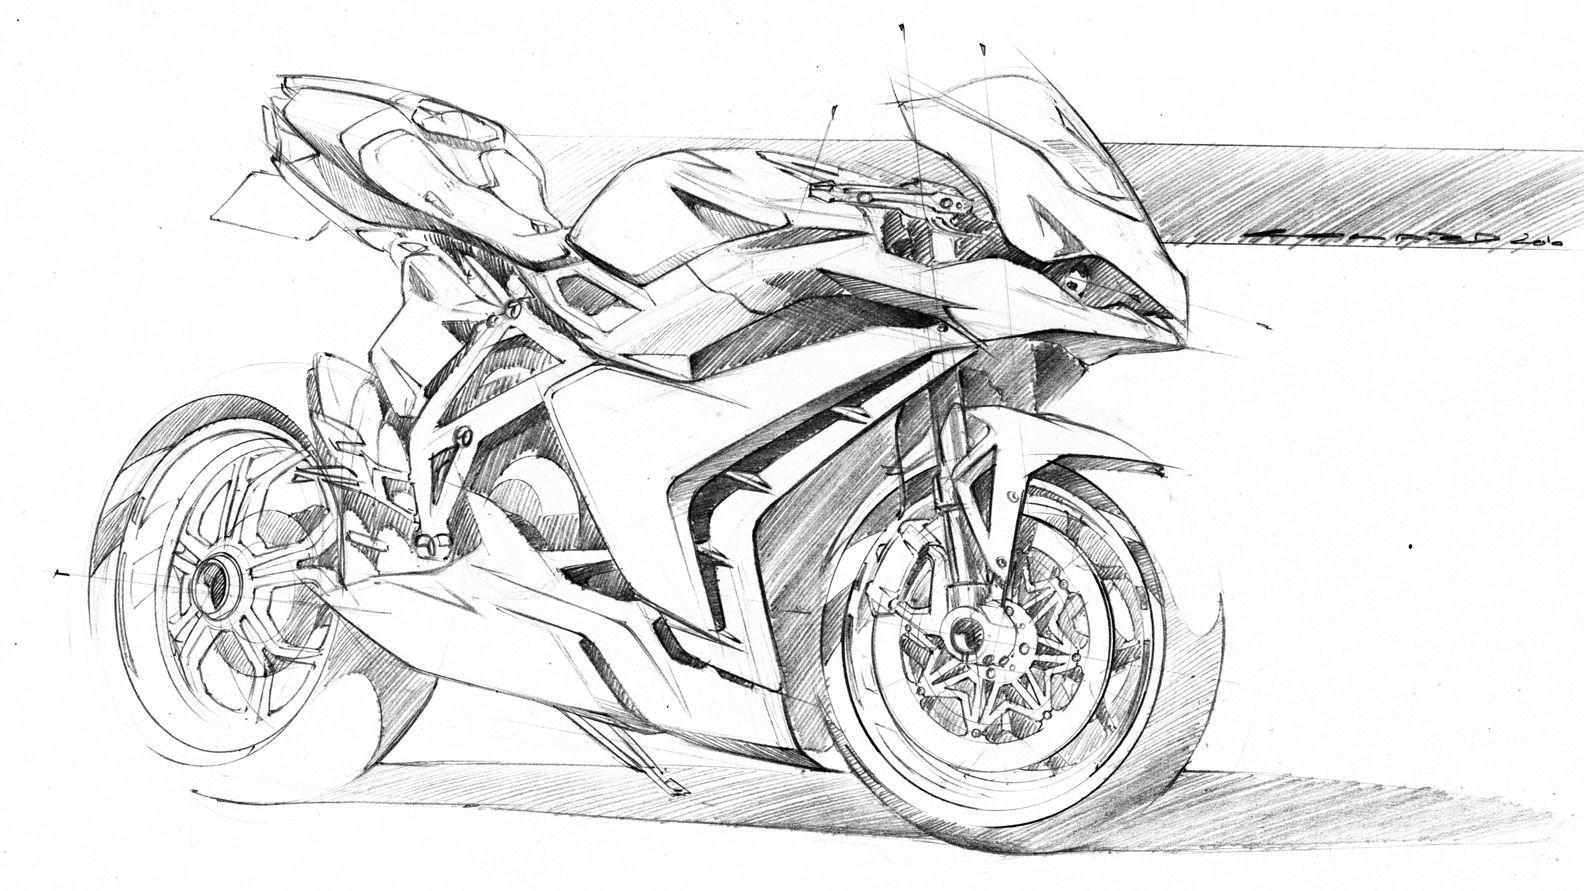 Motorcycle Concept Sketch By Colard